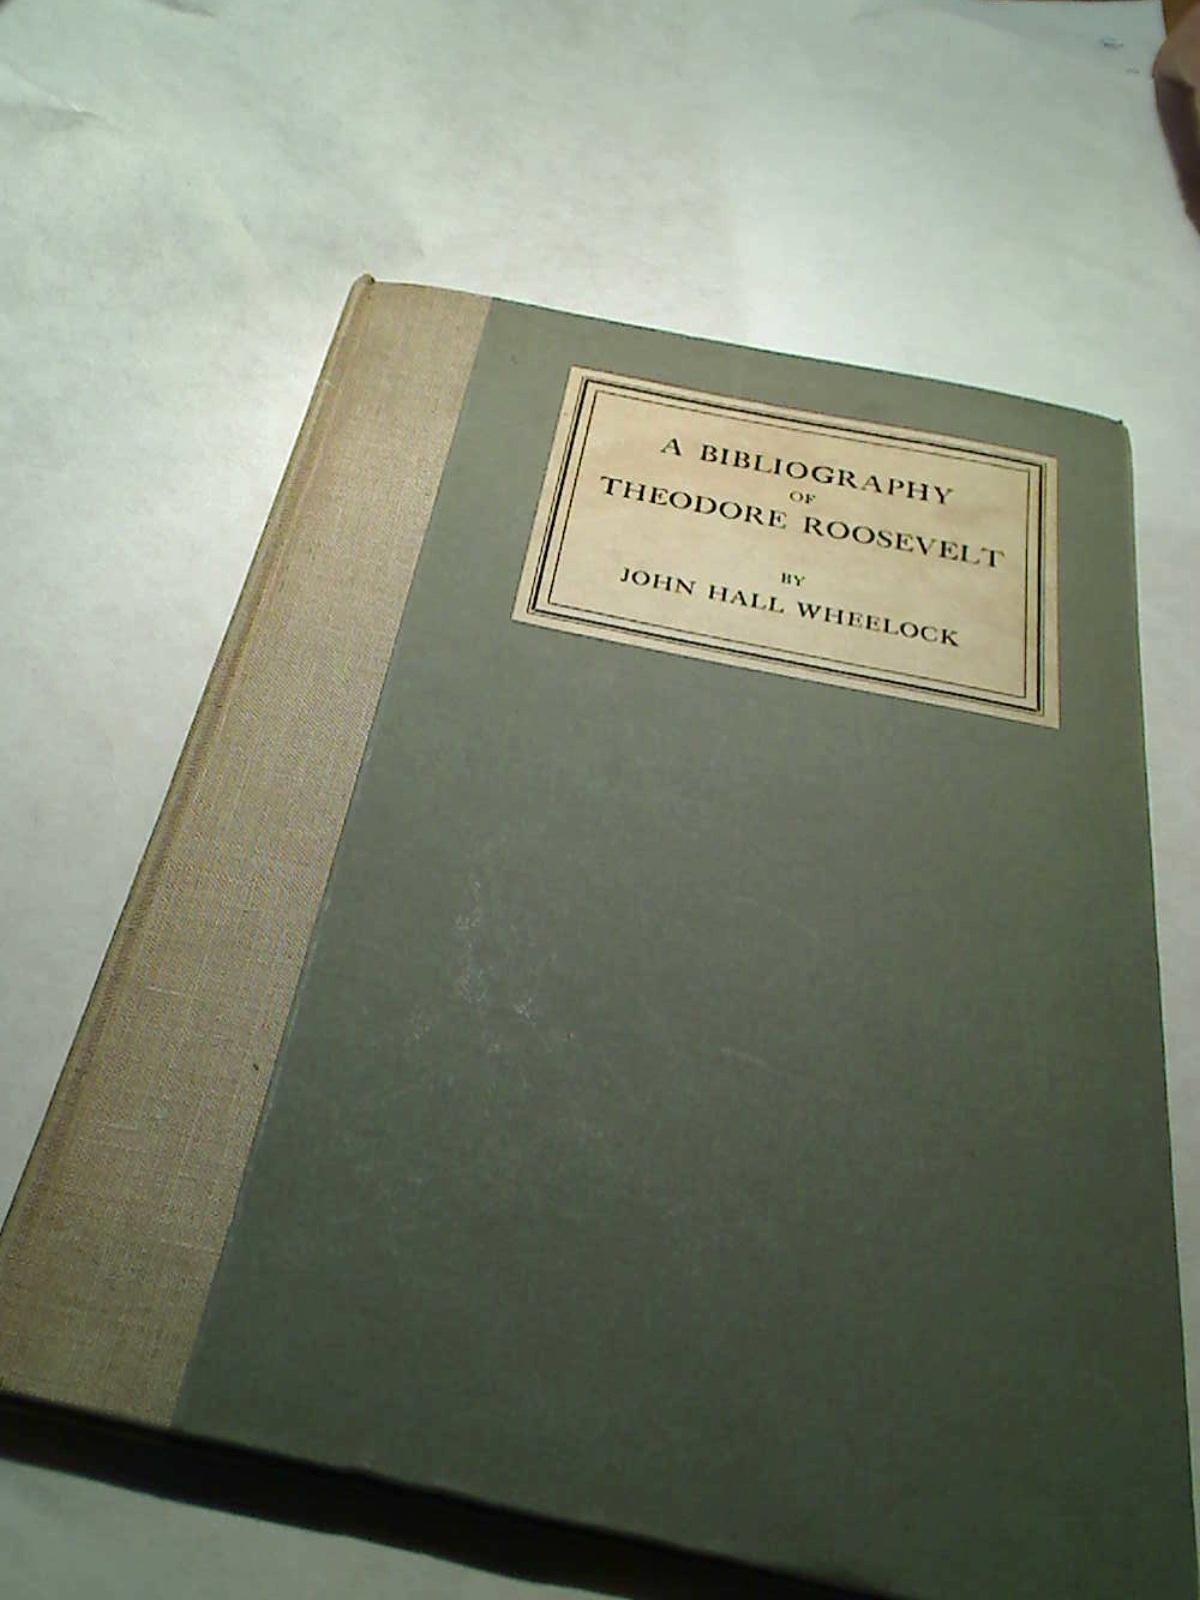 A Bibliography of Theodore Roosevelt.: Wheelock, John Hall: